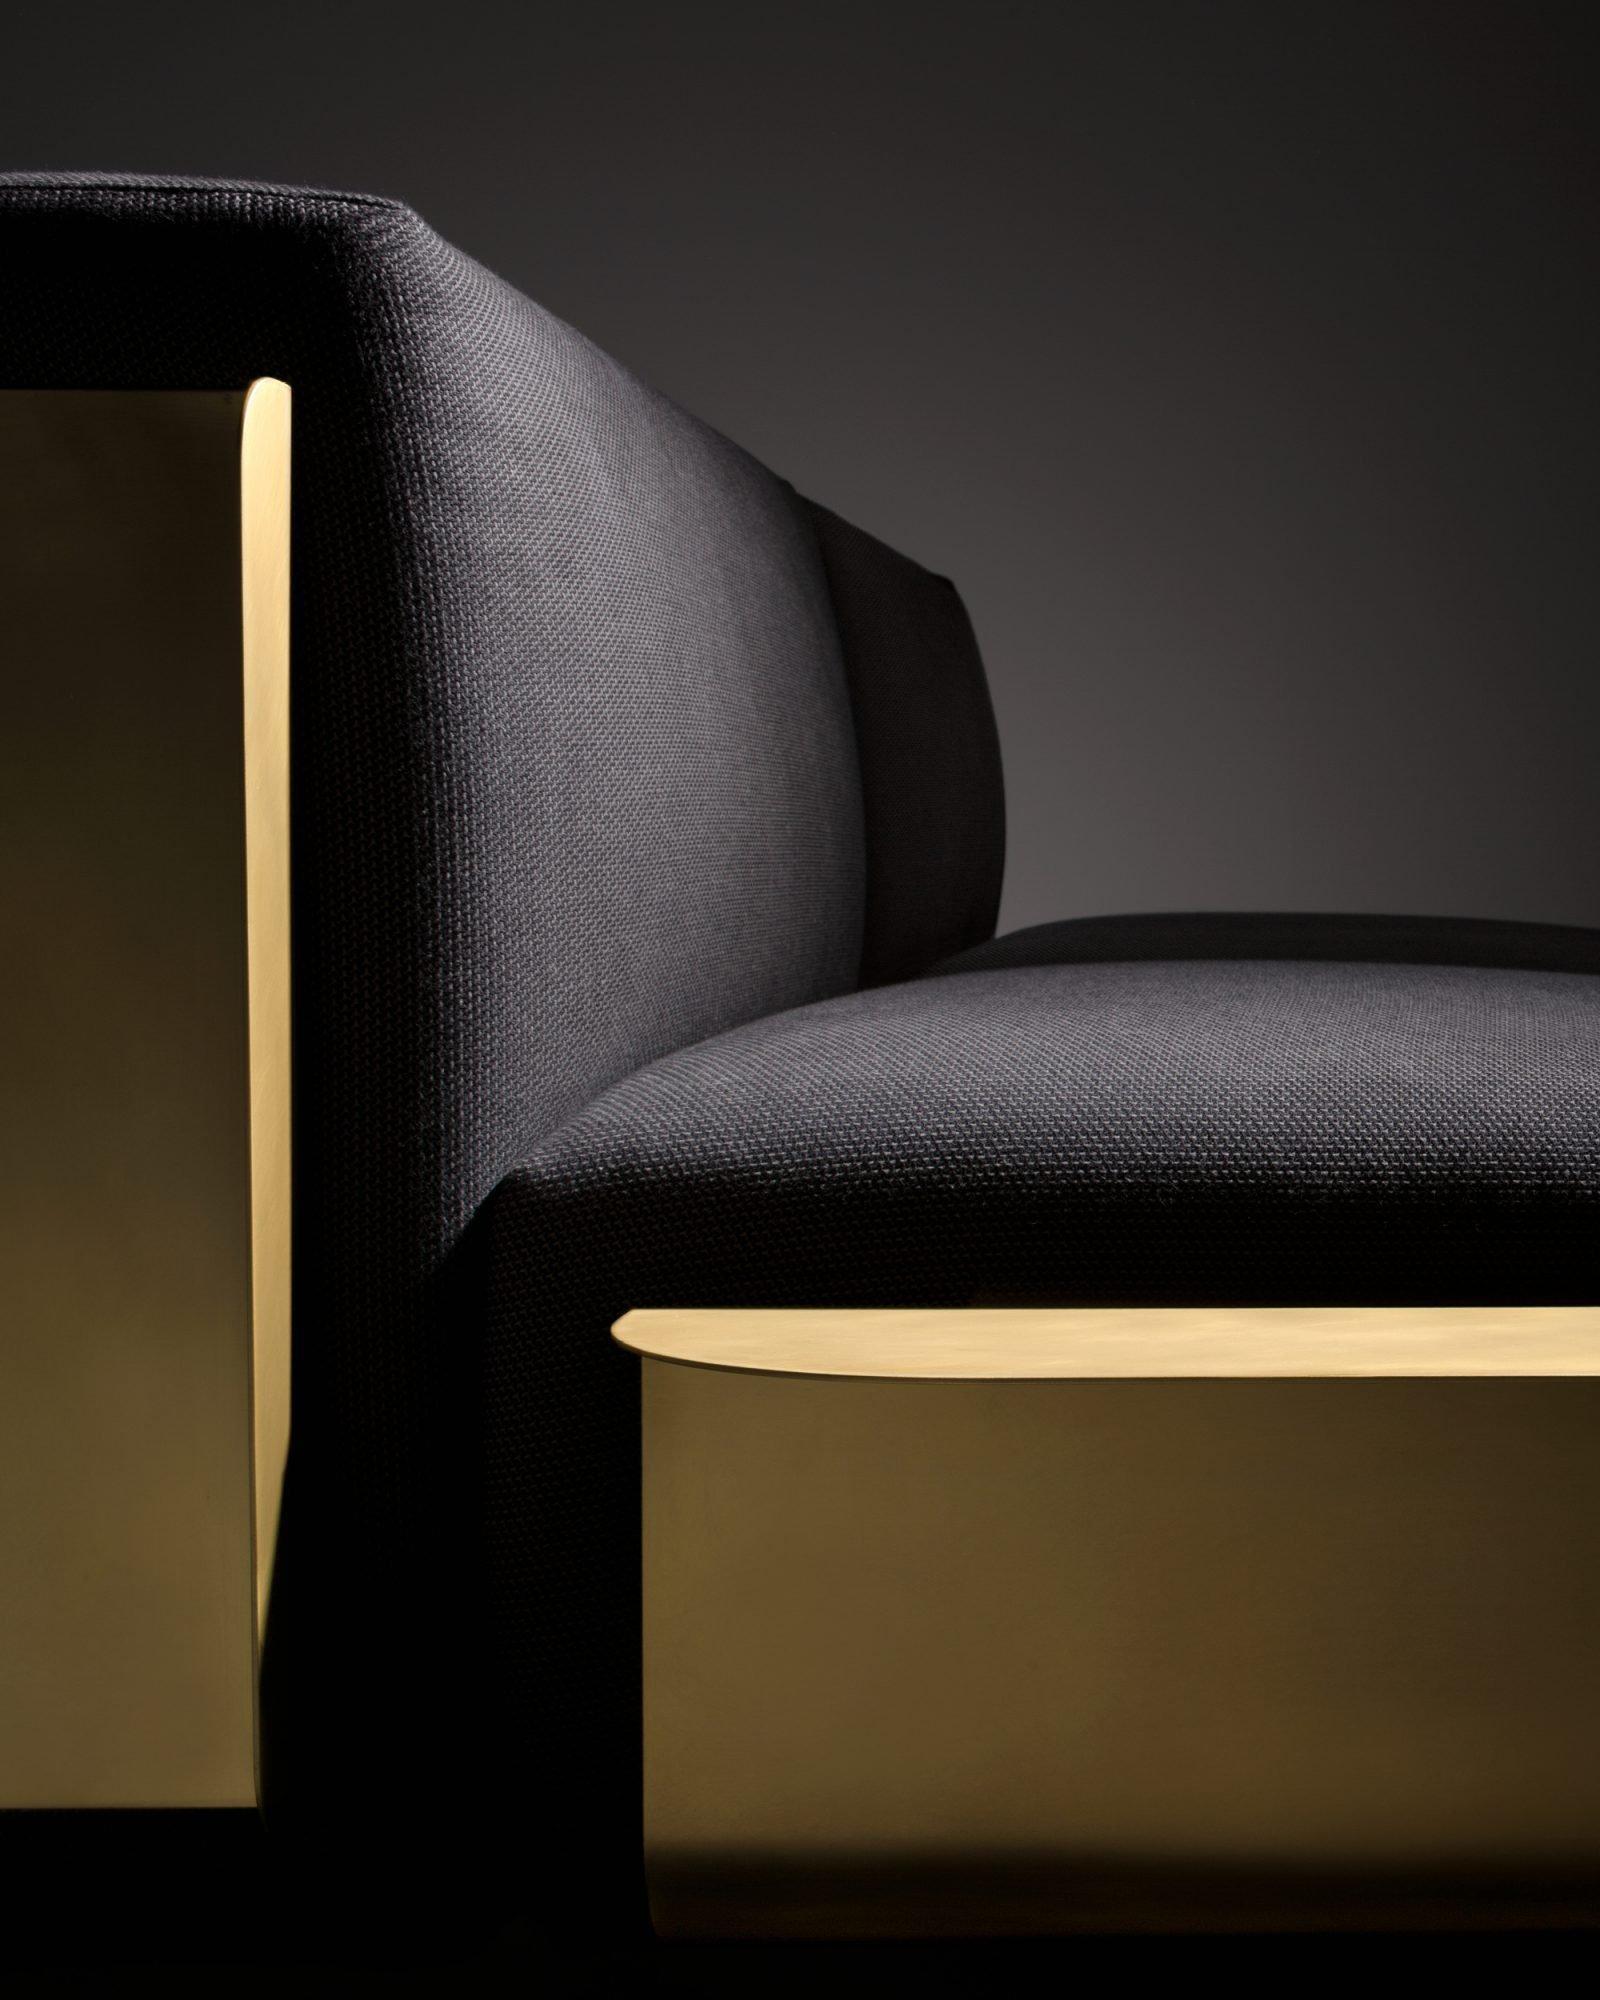 Loom Sofa pouf from De Castelli, designed by Filippo Pisan